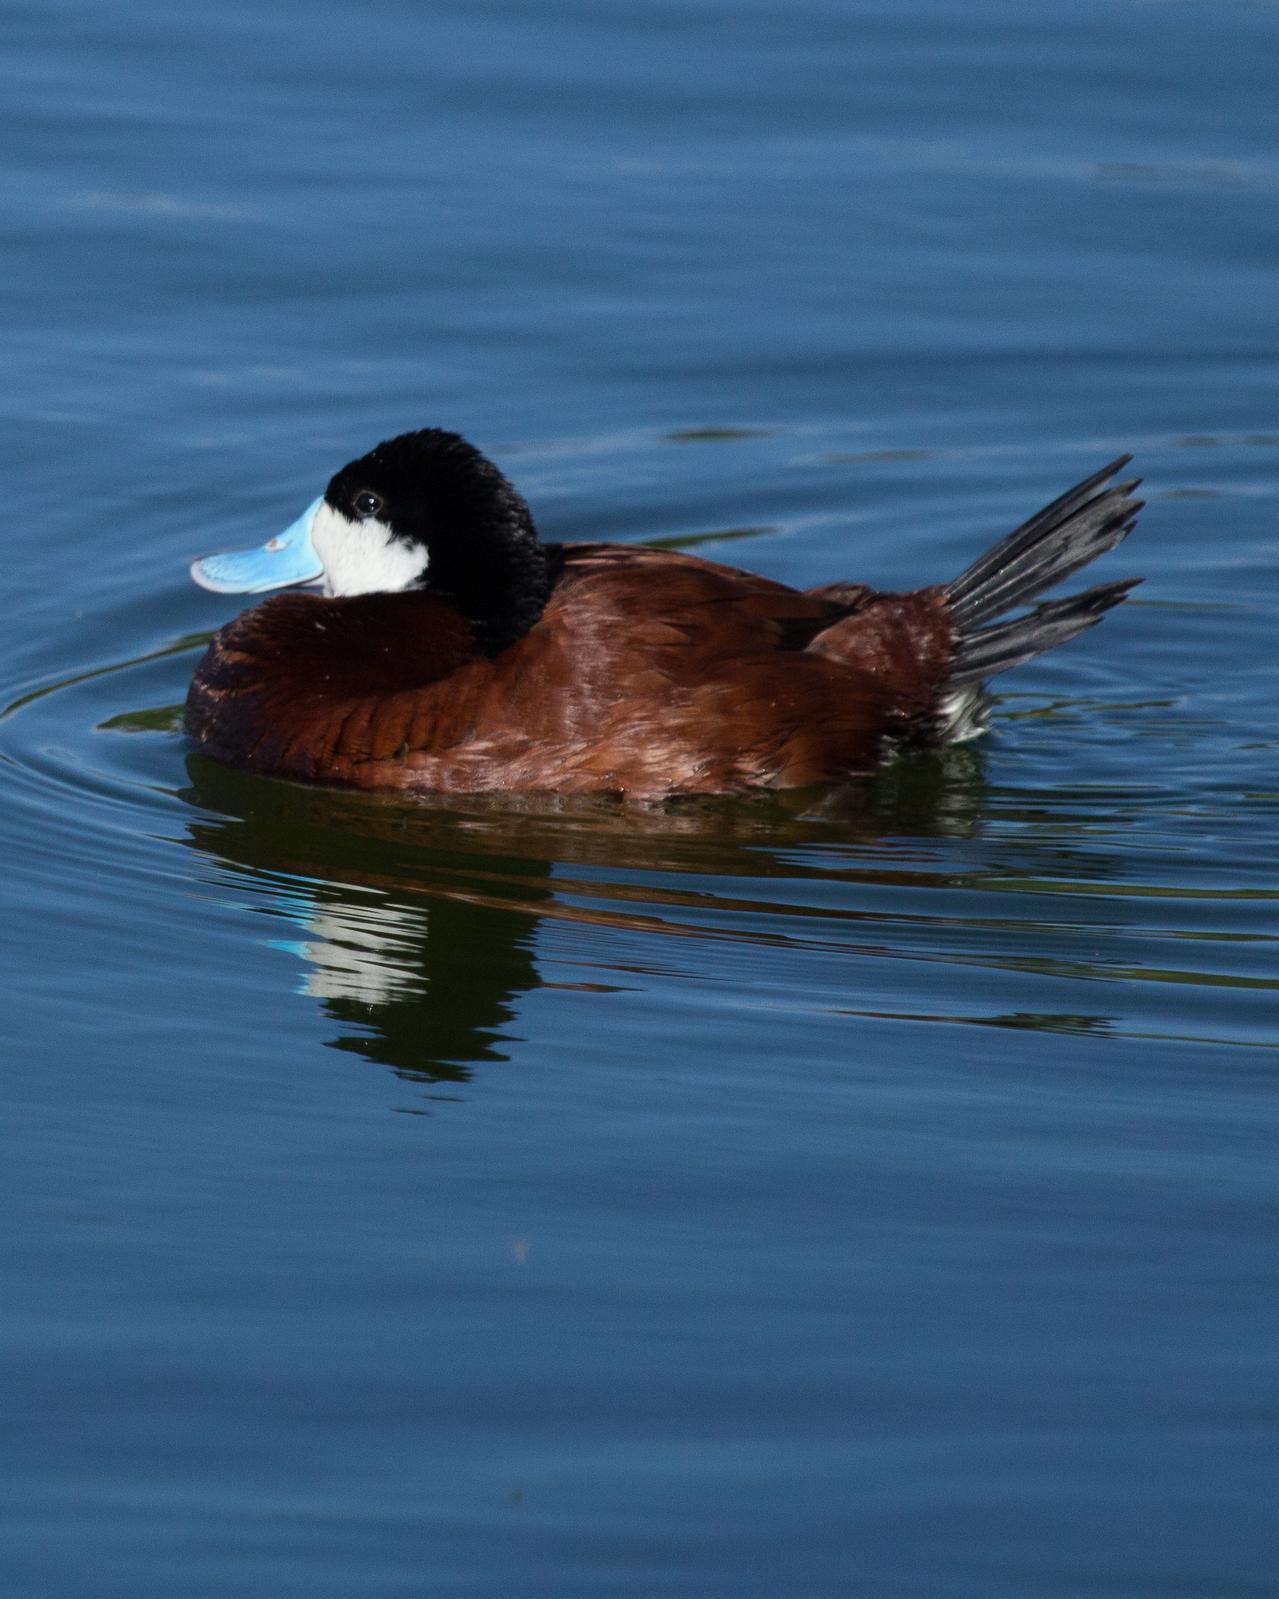 Ruddy Duck Photo by Anita Strawn de Ojeda